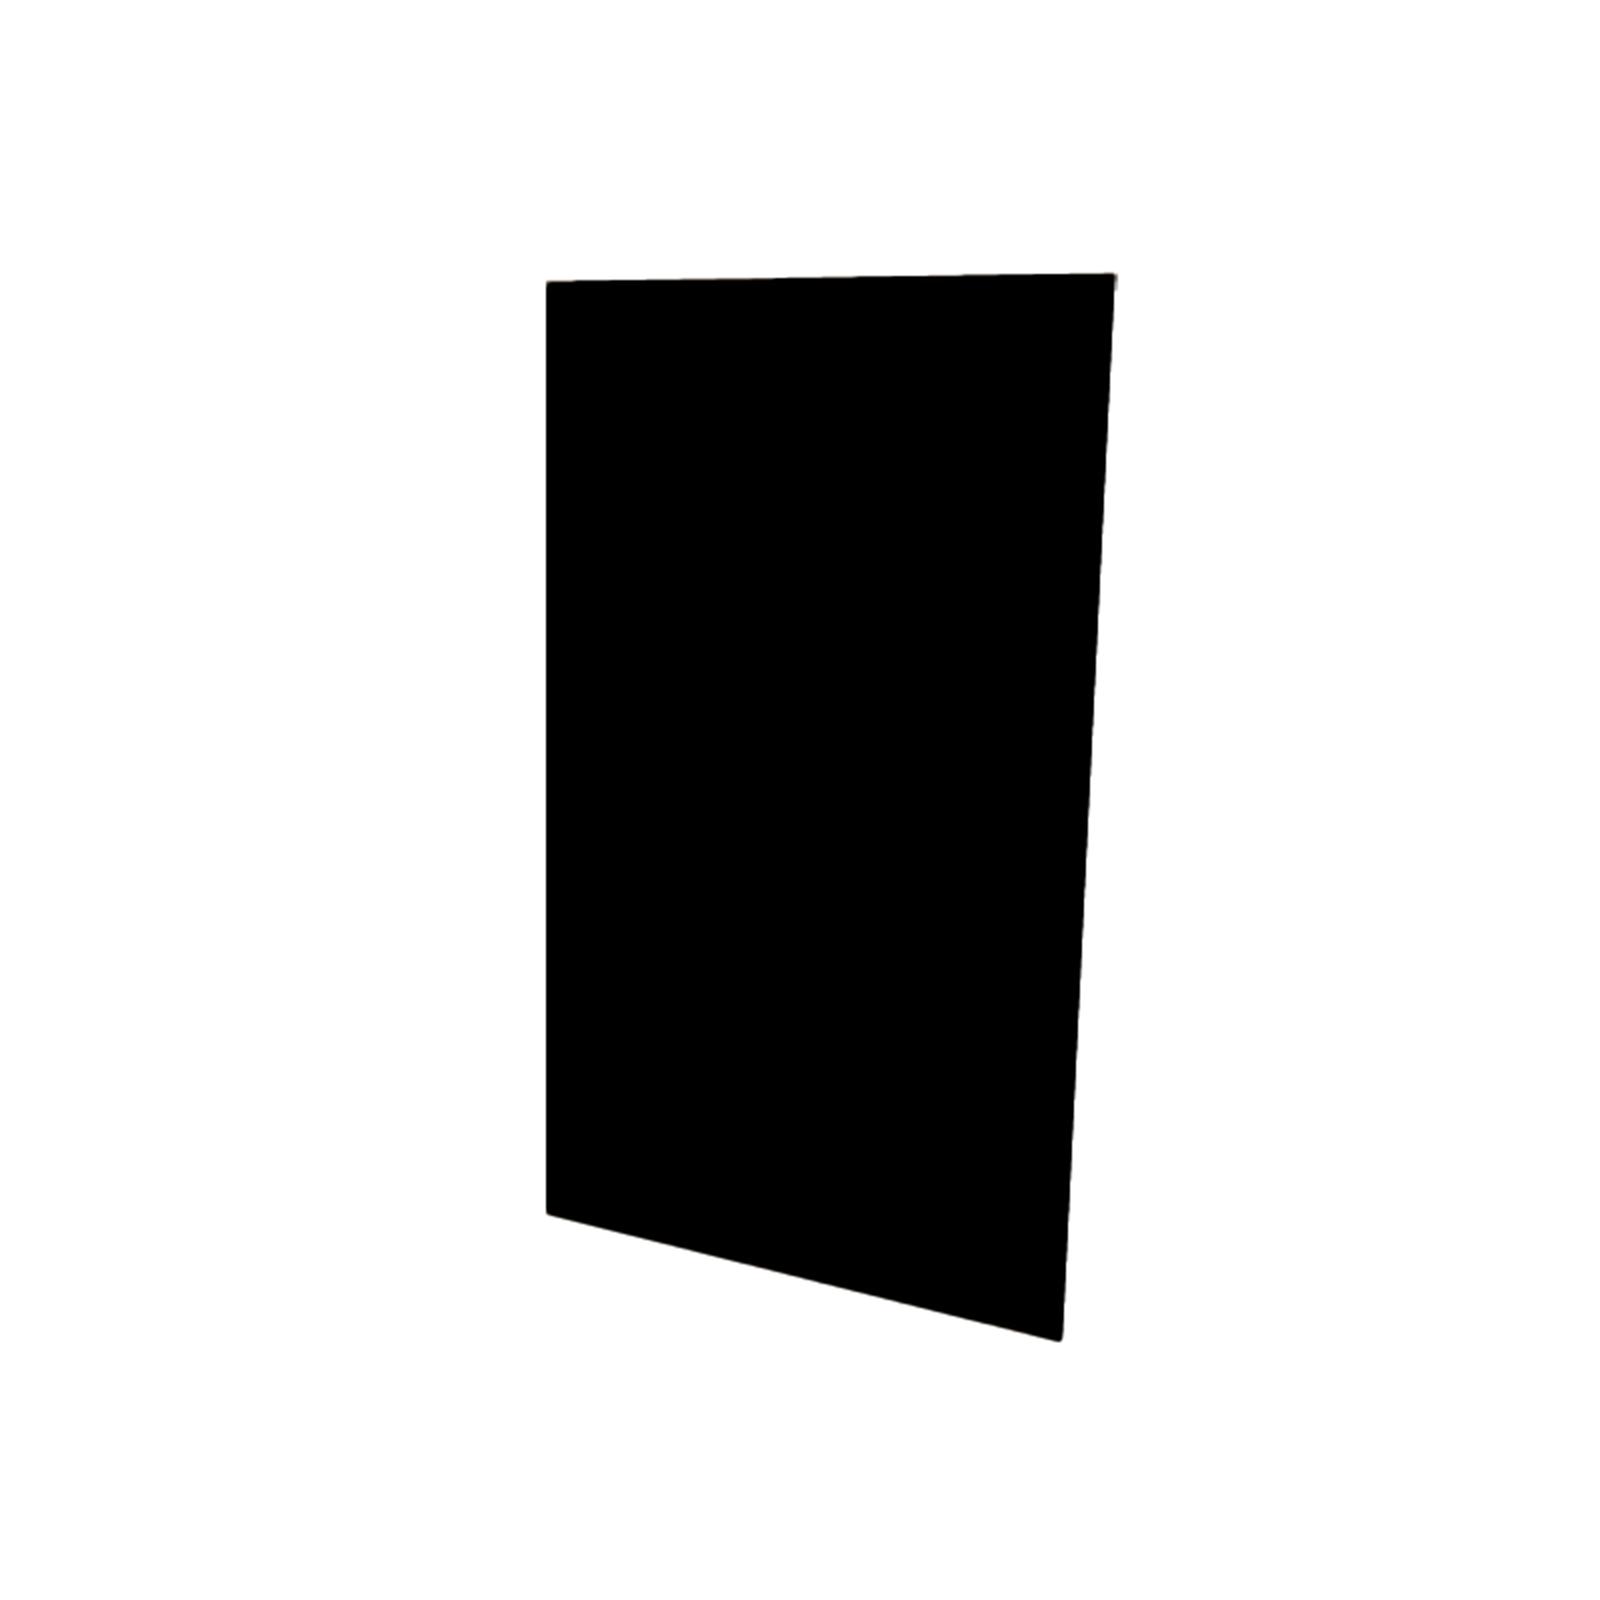 Vistelle 2070 x 1250 x 4mm Eclipse High Gloss Acrylic Bathroom Panel